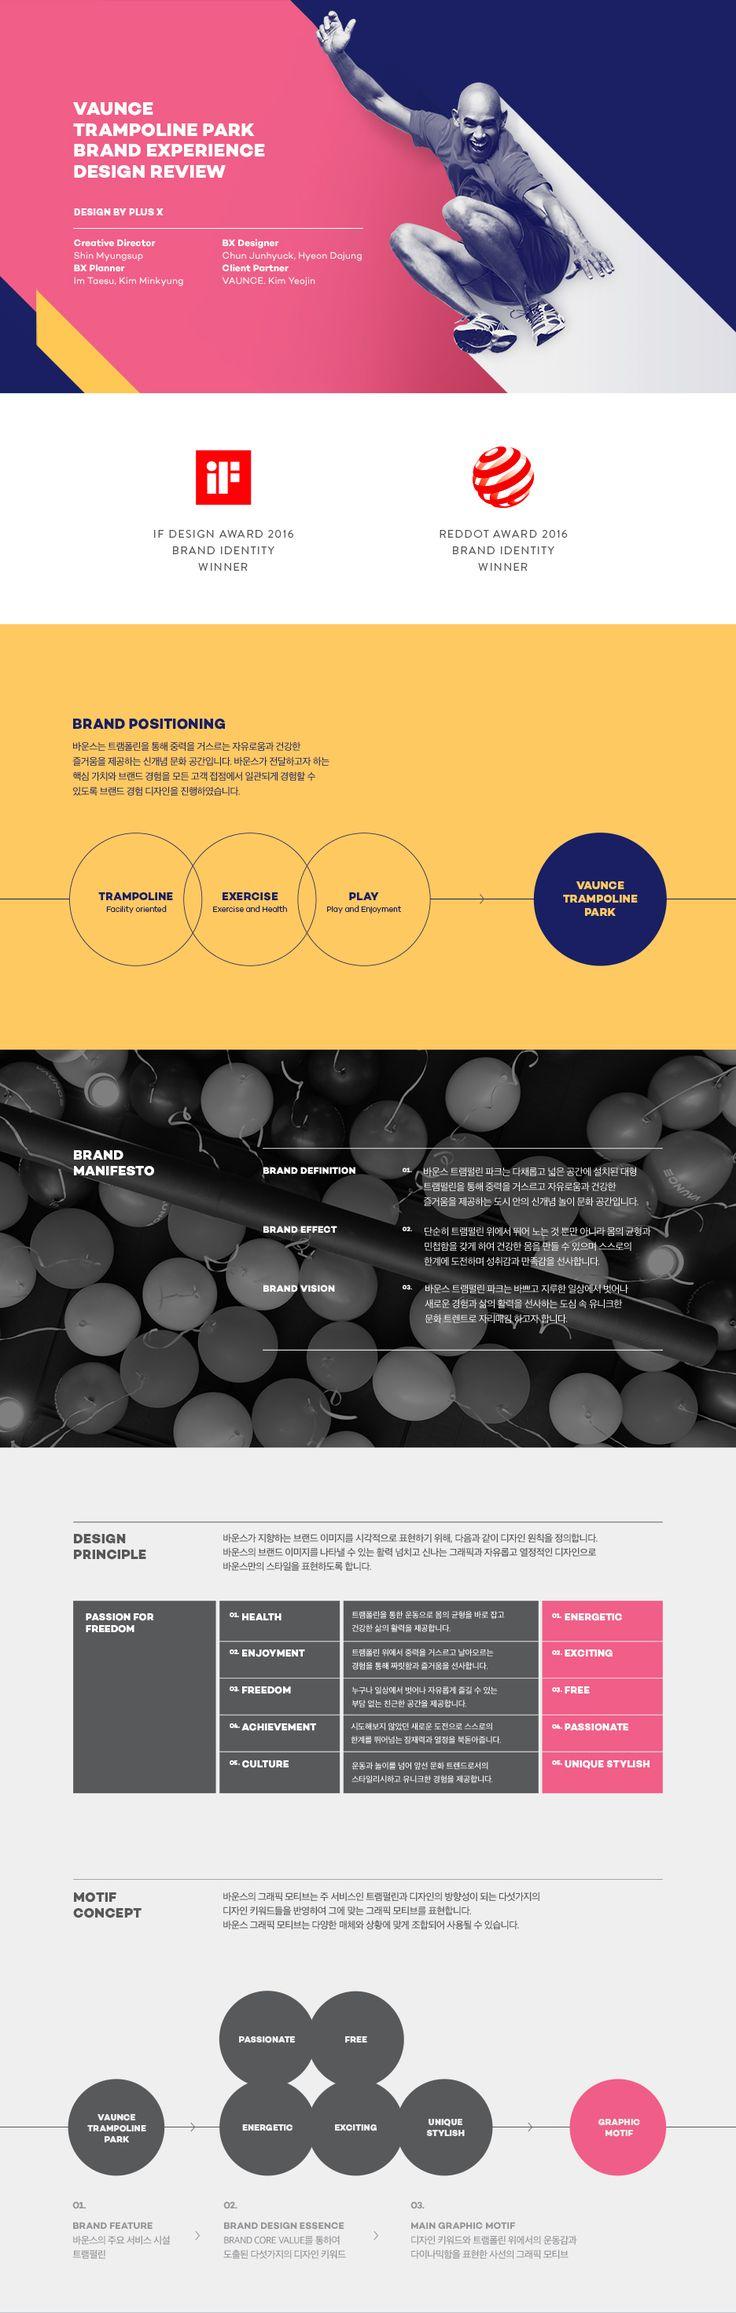 +X, shinDsoul : 네이버 블로그